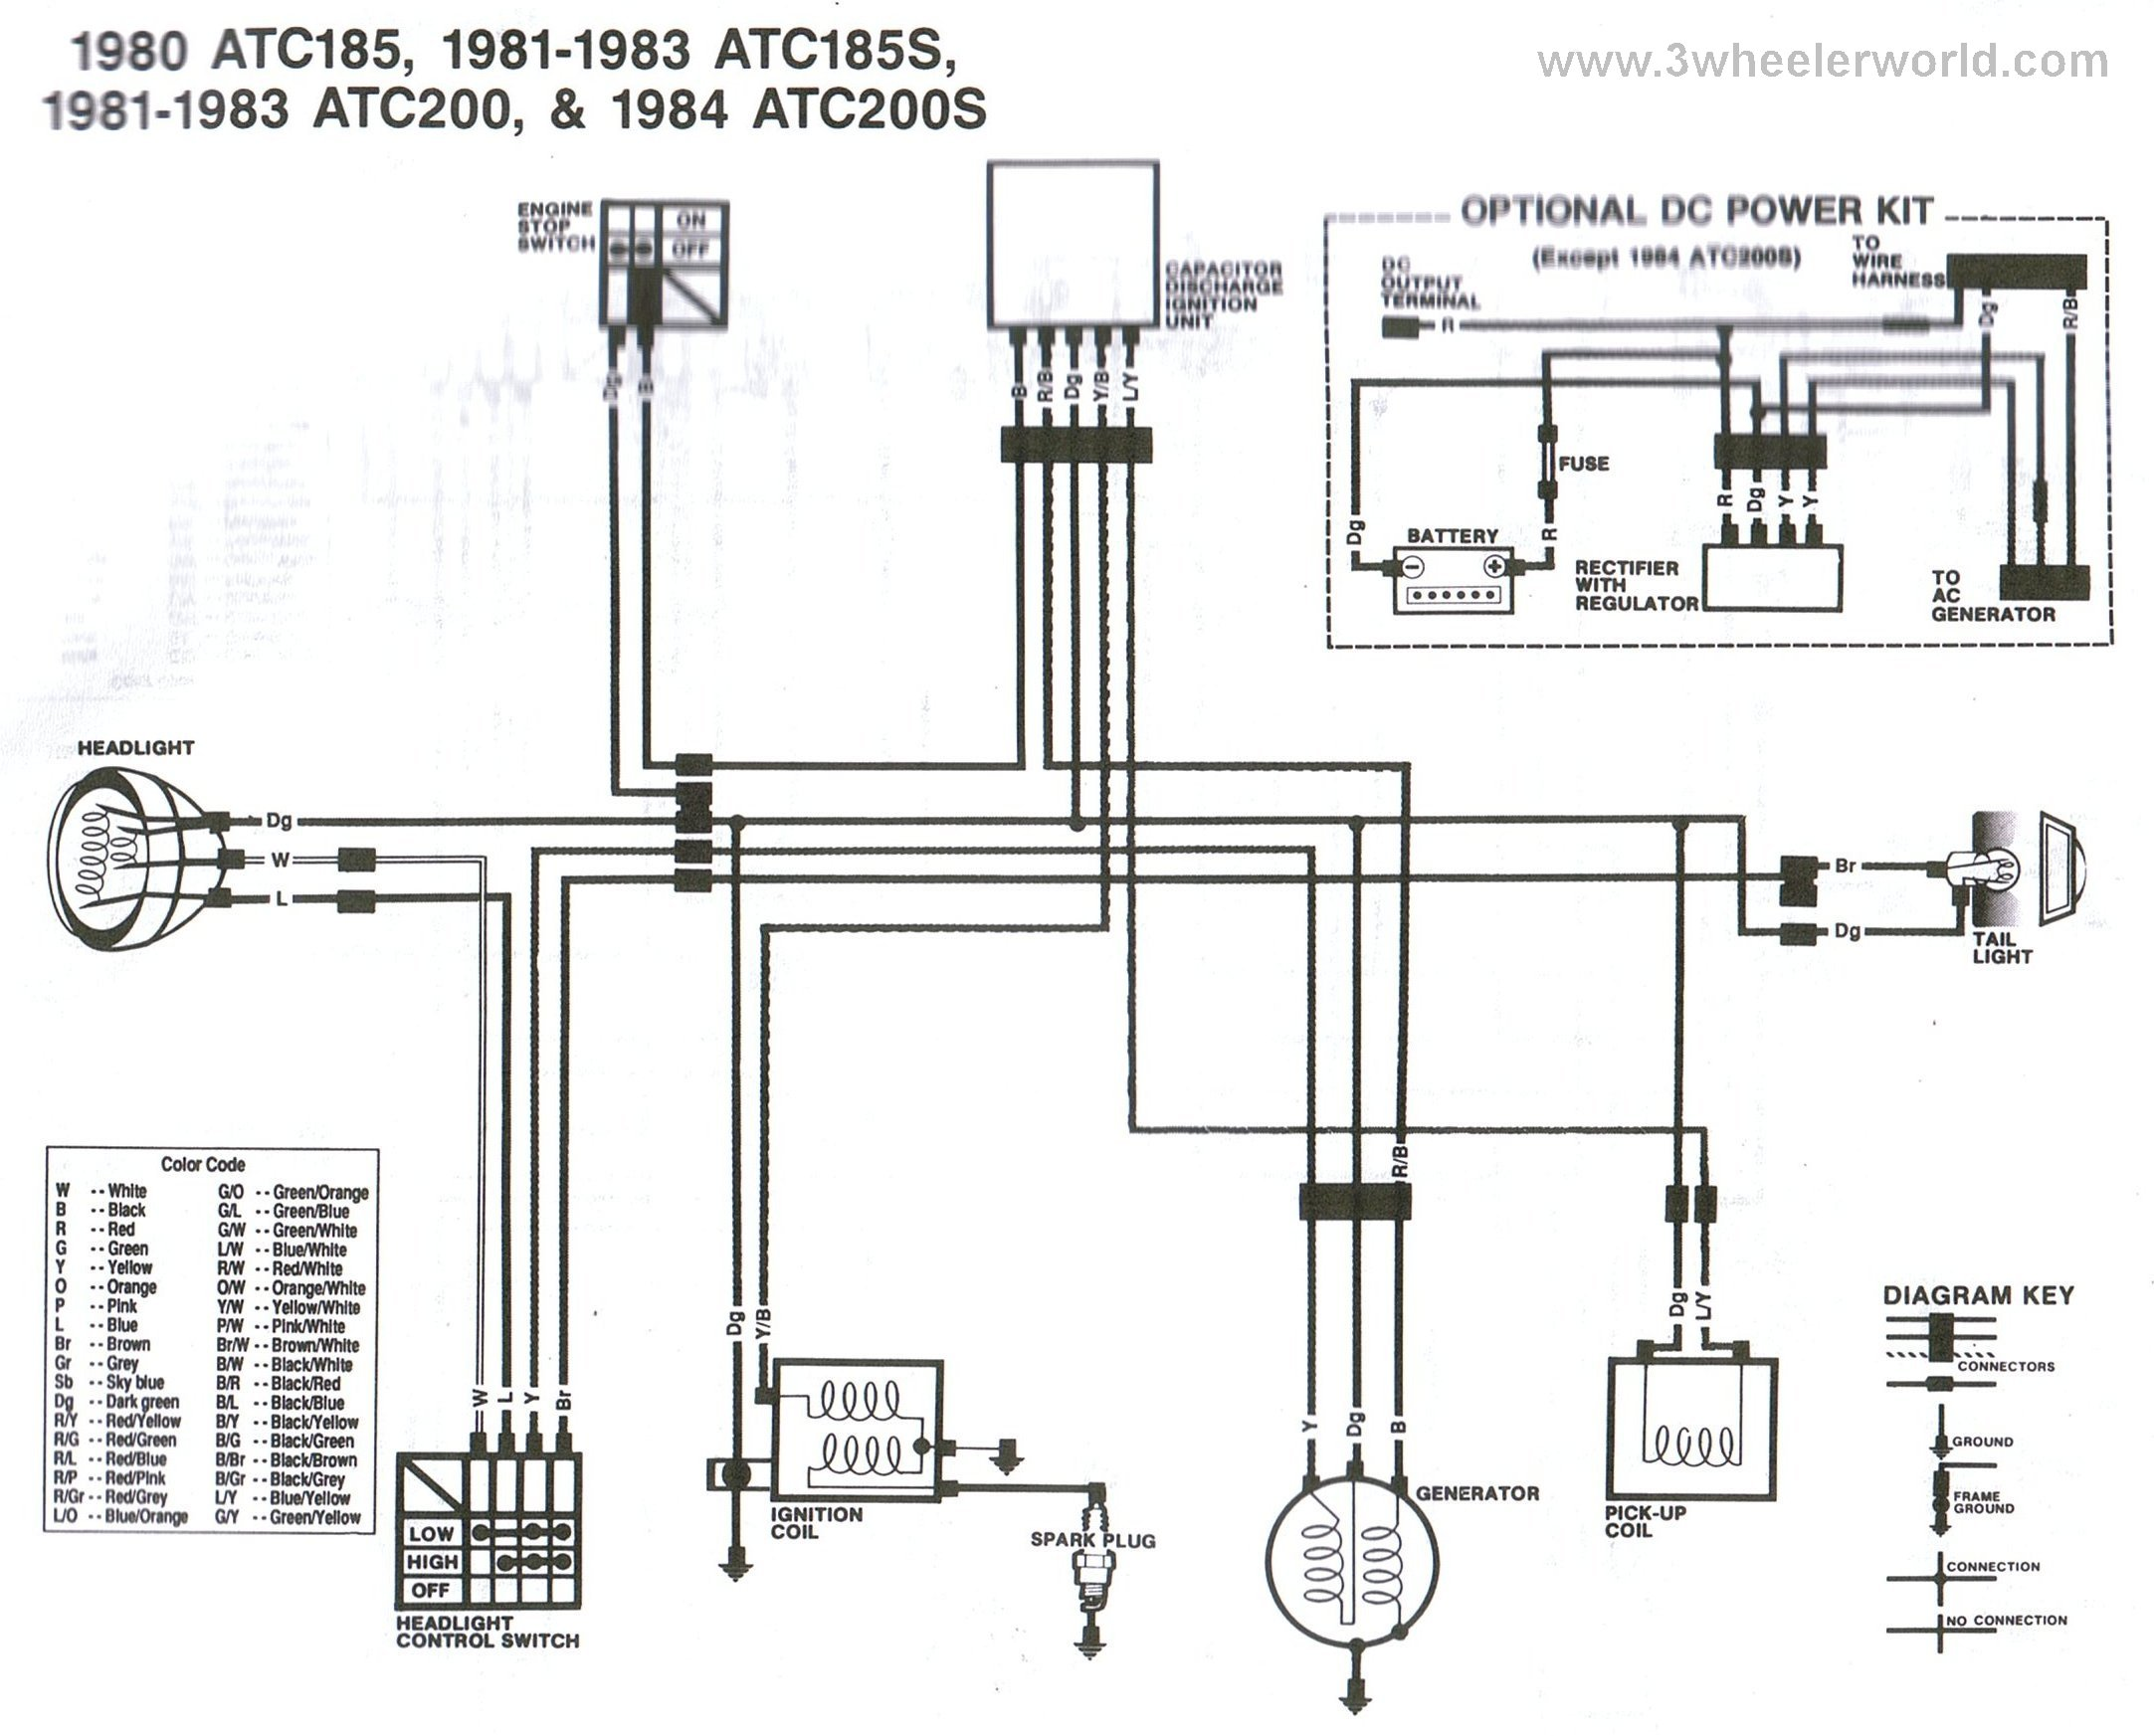 kawasaki klf220 wiring diagram 1997 dodge intrepid engine honda 90 data atc we 350 200e